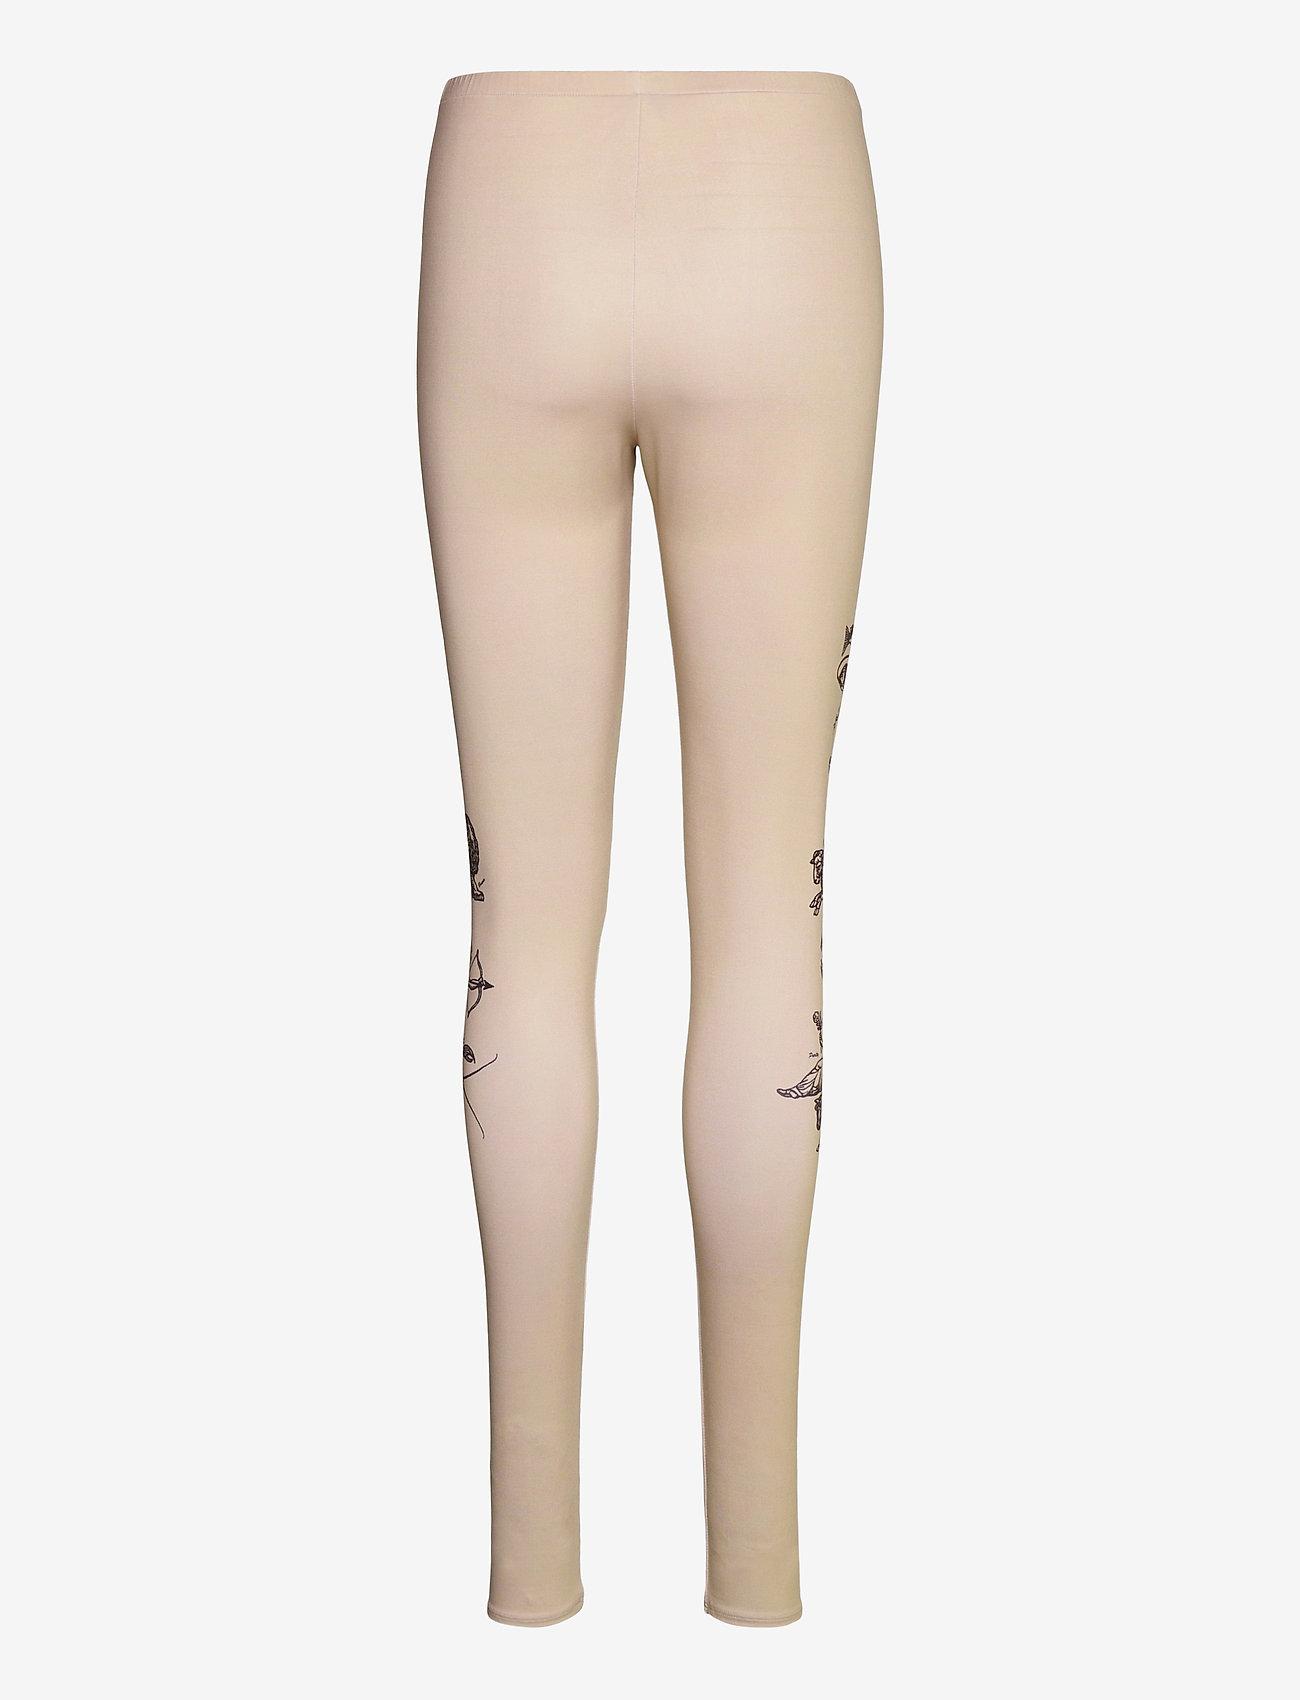 Soulland - Ying leggings - leggings - beige - 2